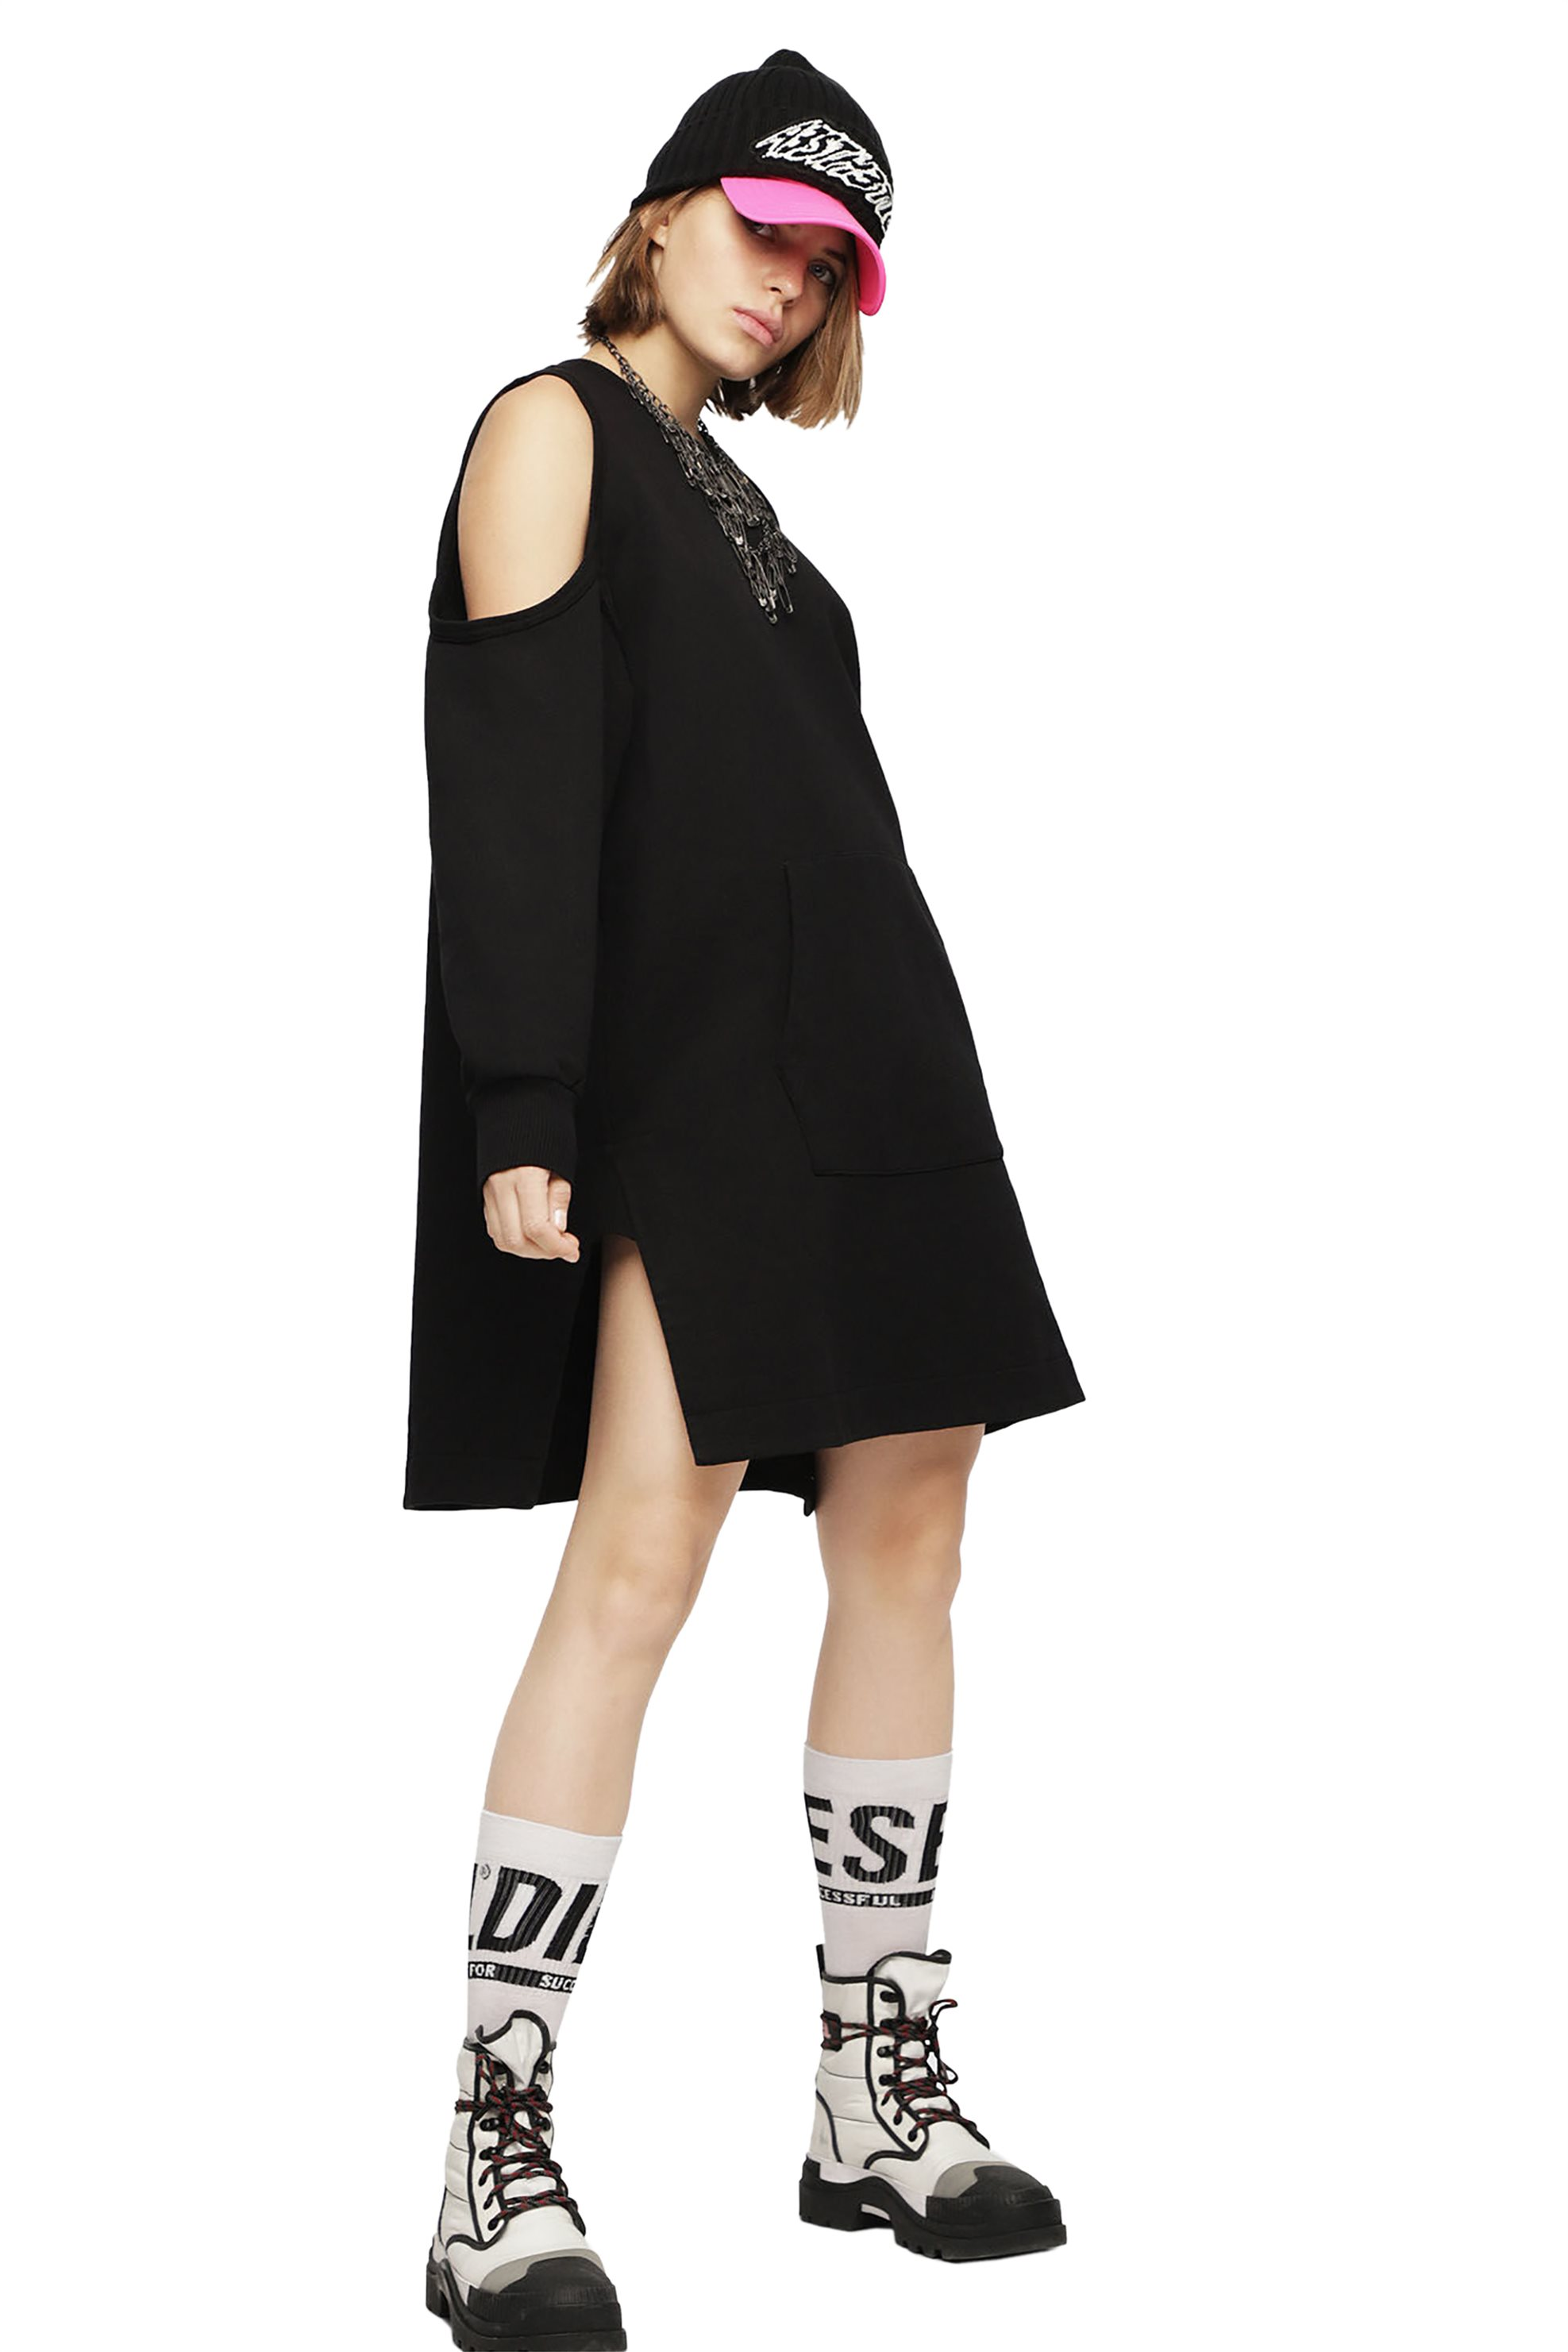 2e61d75c561d Notos Diesel γυναικείο oversized φόρεμα-φούτερ Ema - 00SM7D 0JASE - Μαύρο